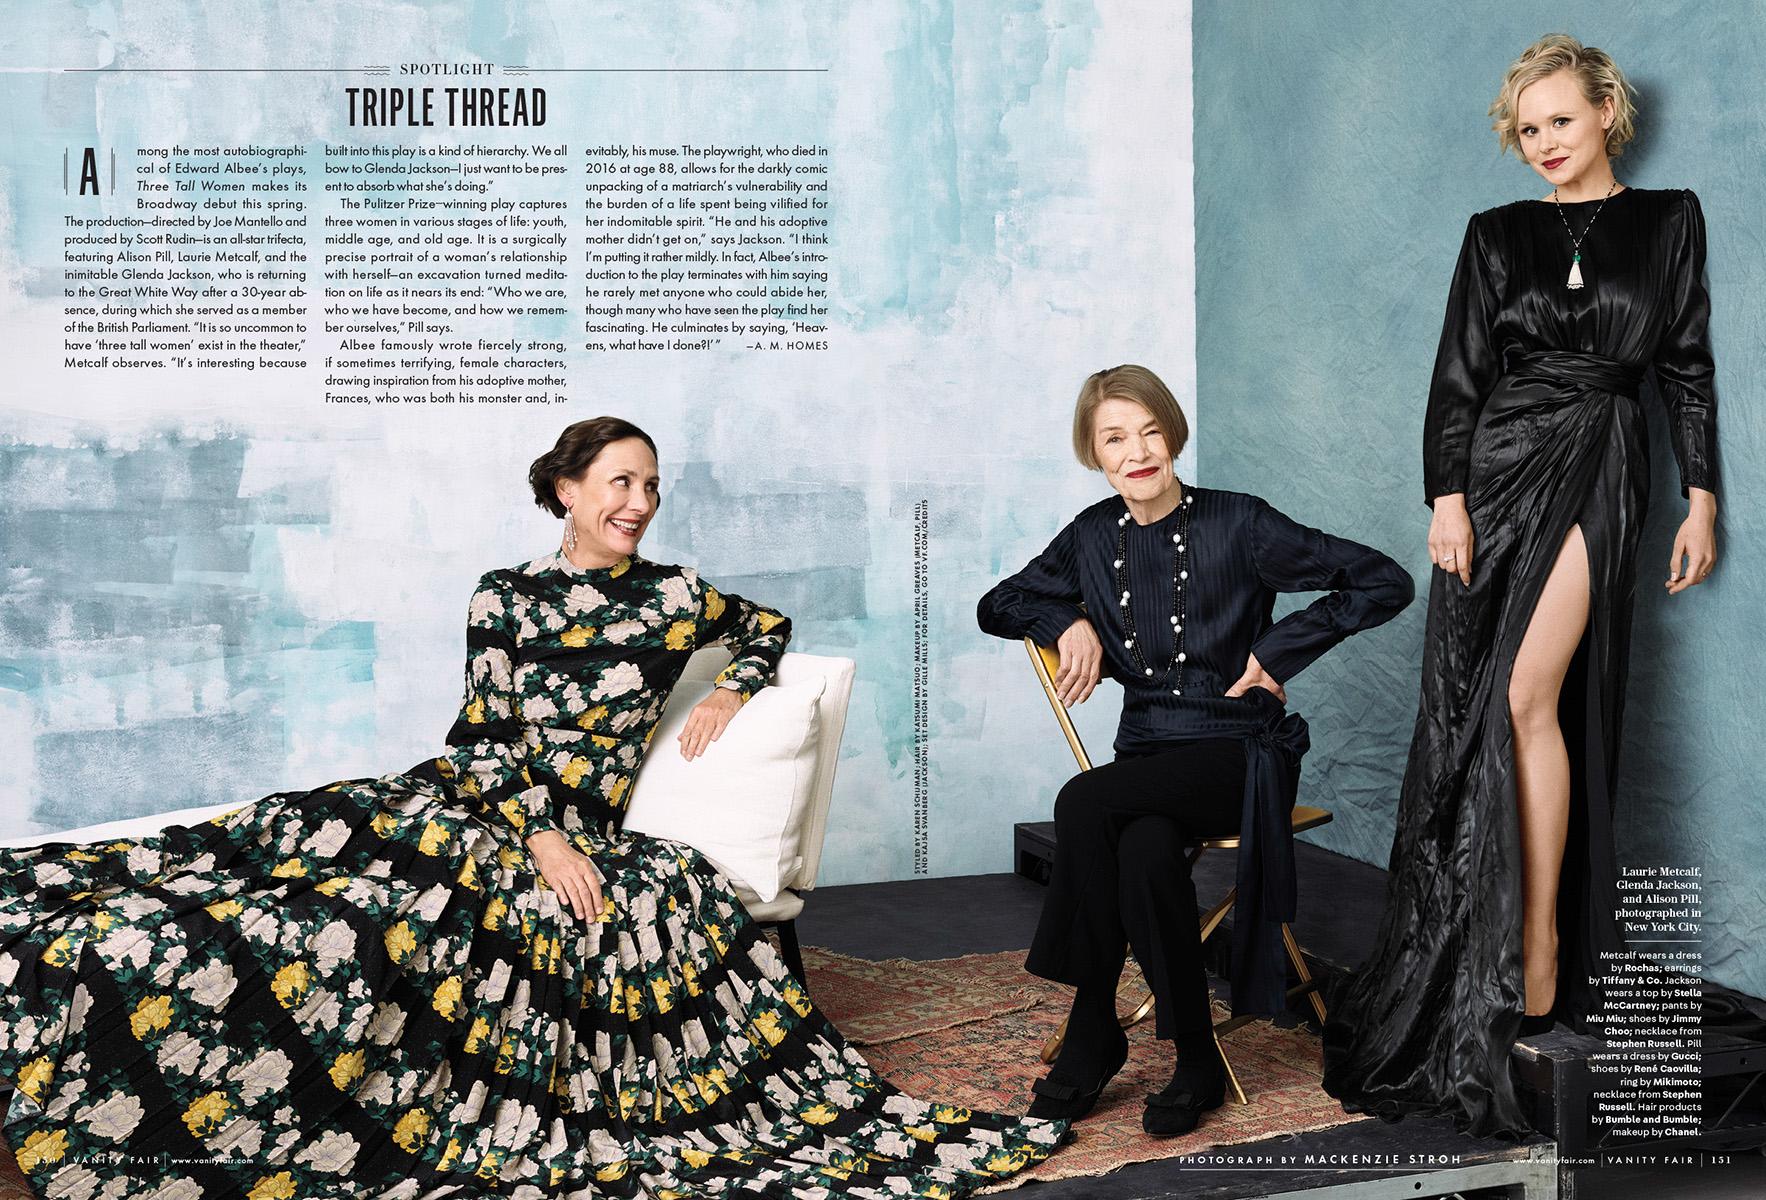 Vanity Fair USA / Laurie Metcalf / Glenda Jackson / Alison Pill